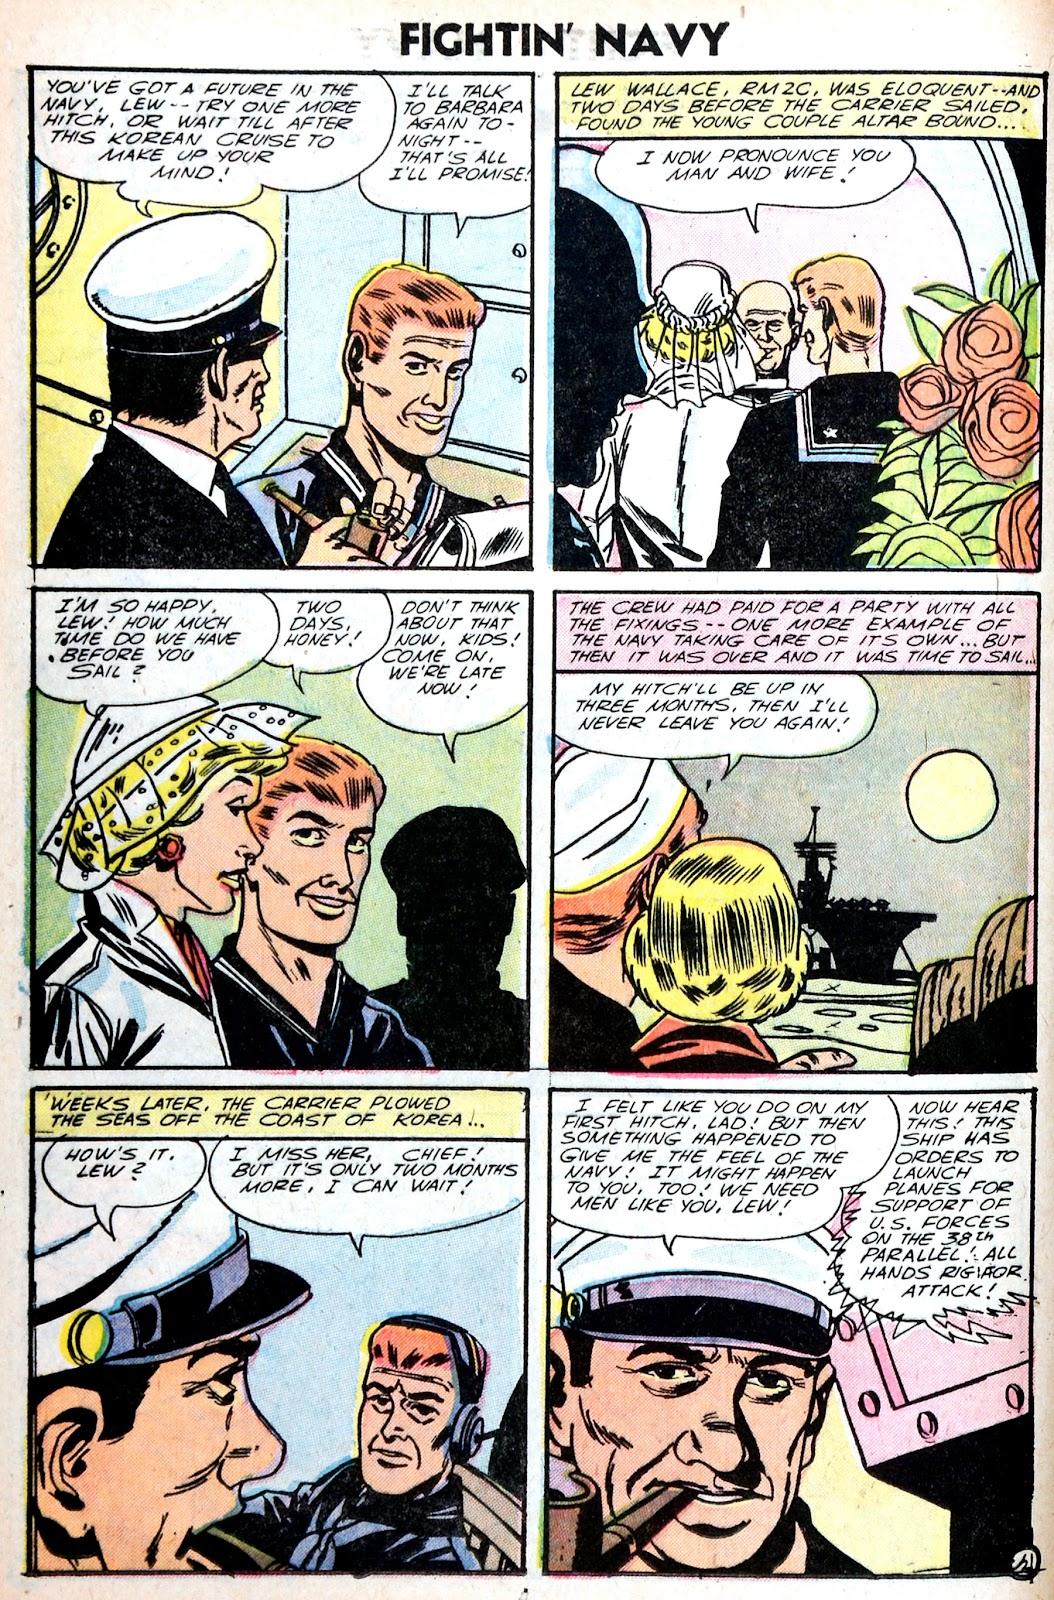 Read online Fightin' Navy comic -  Issue #75 - 12